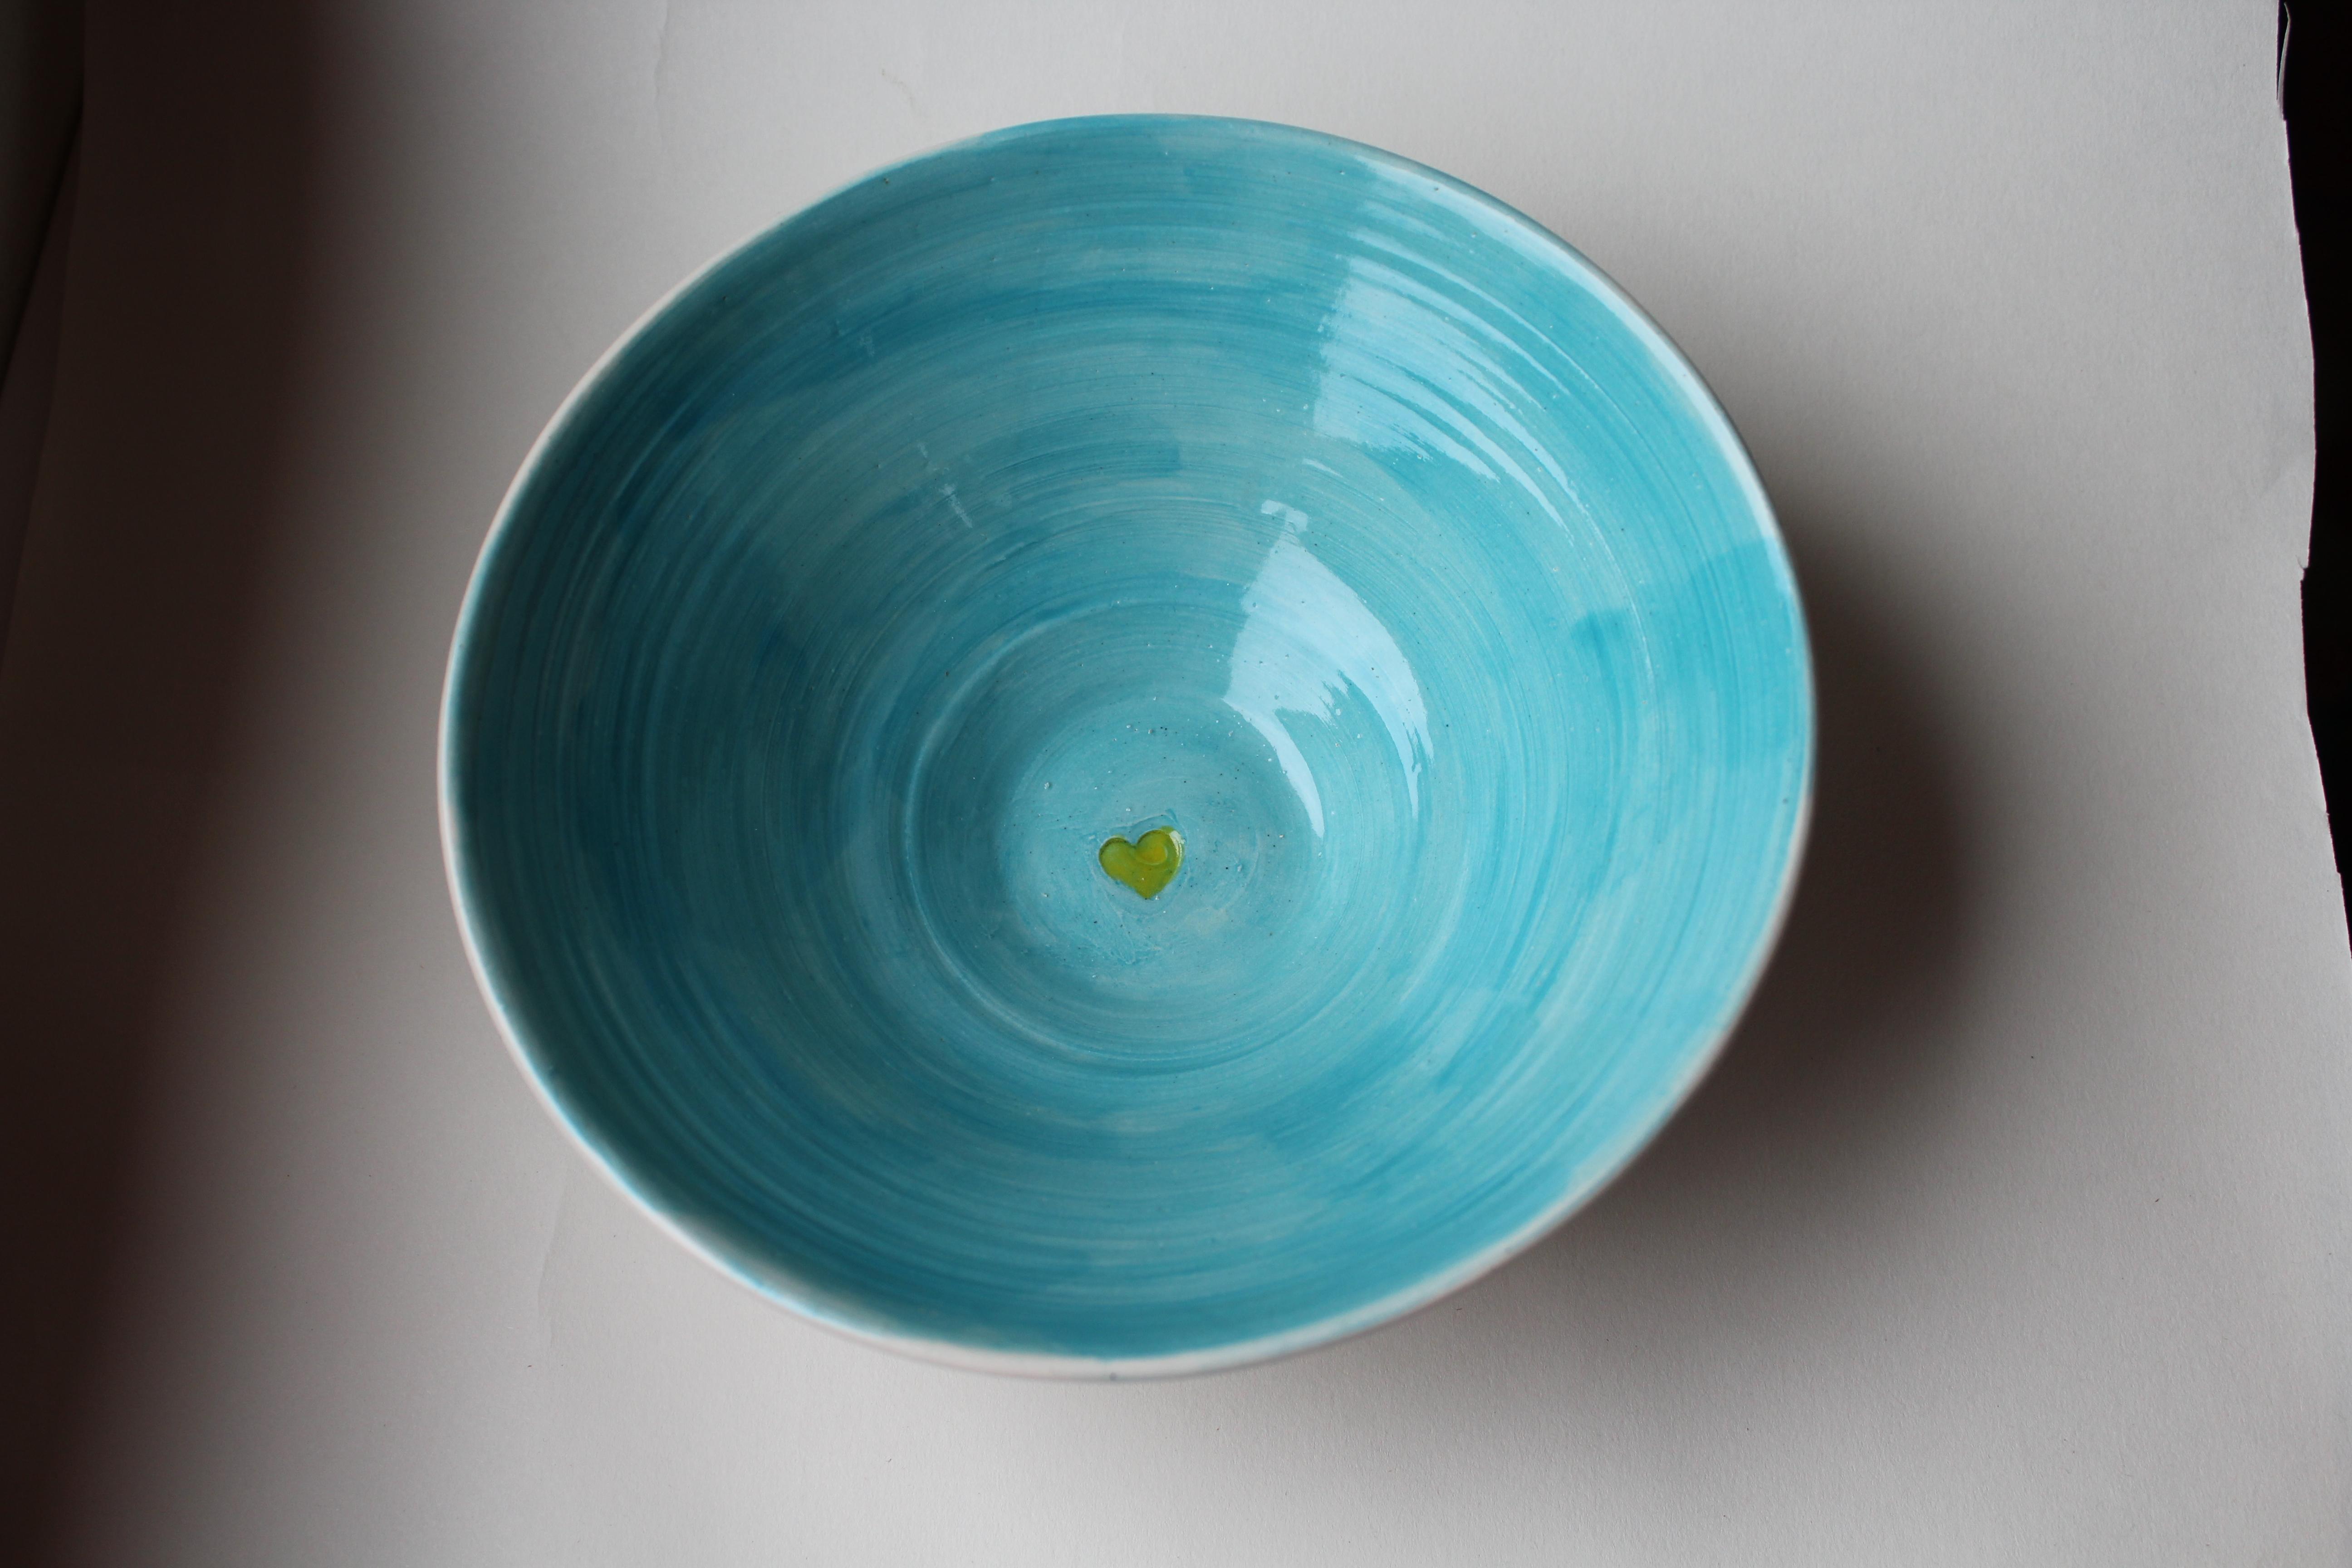 saladier turquoise